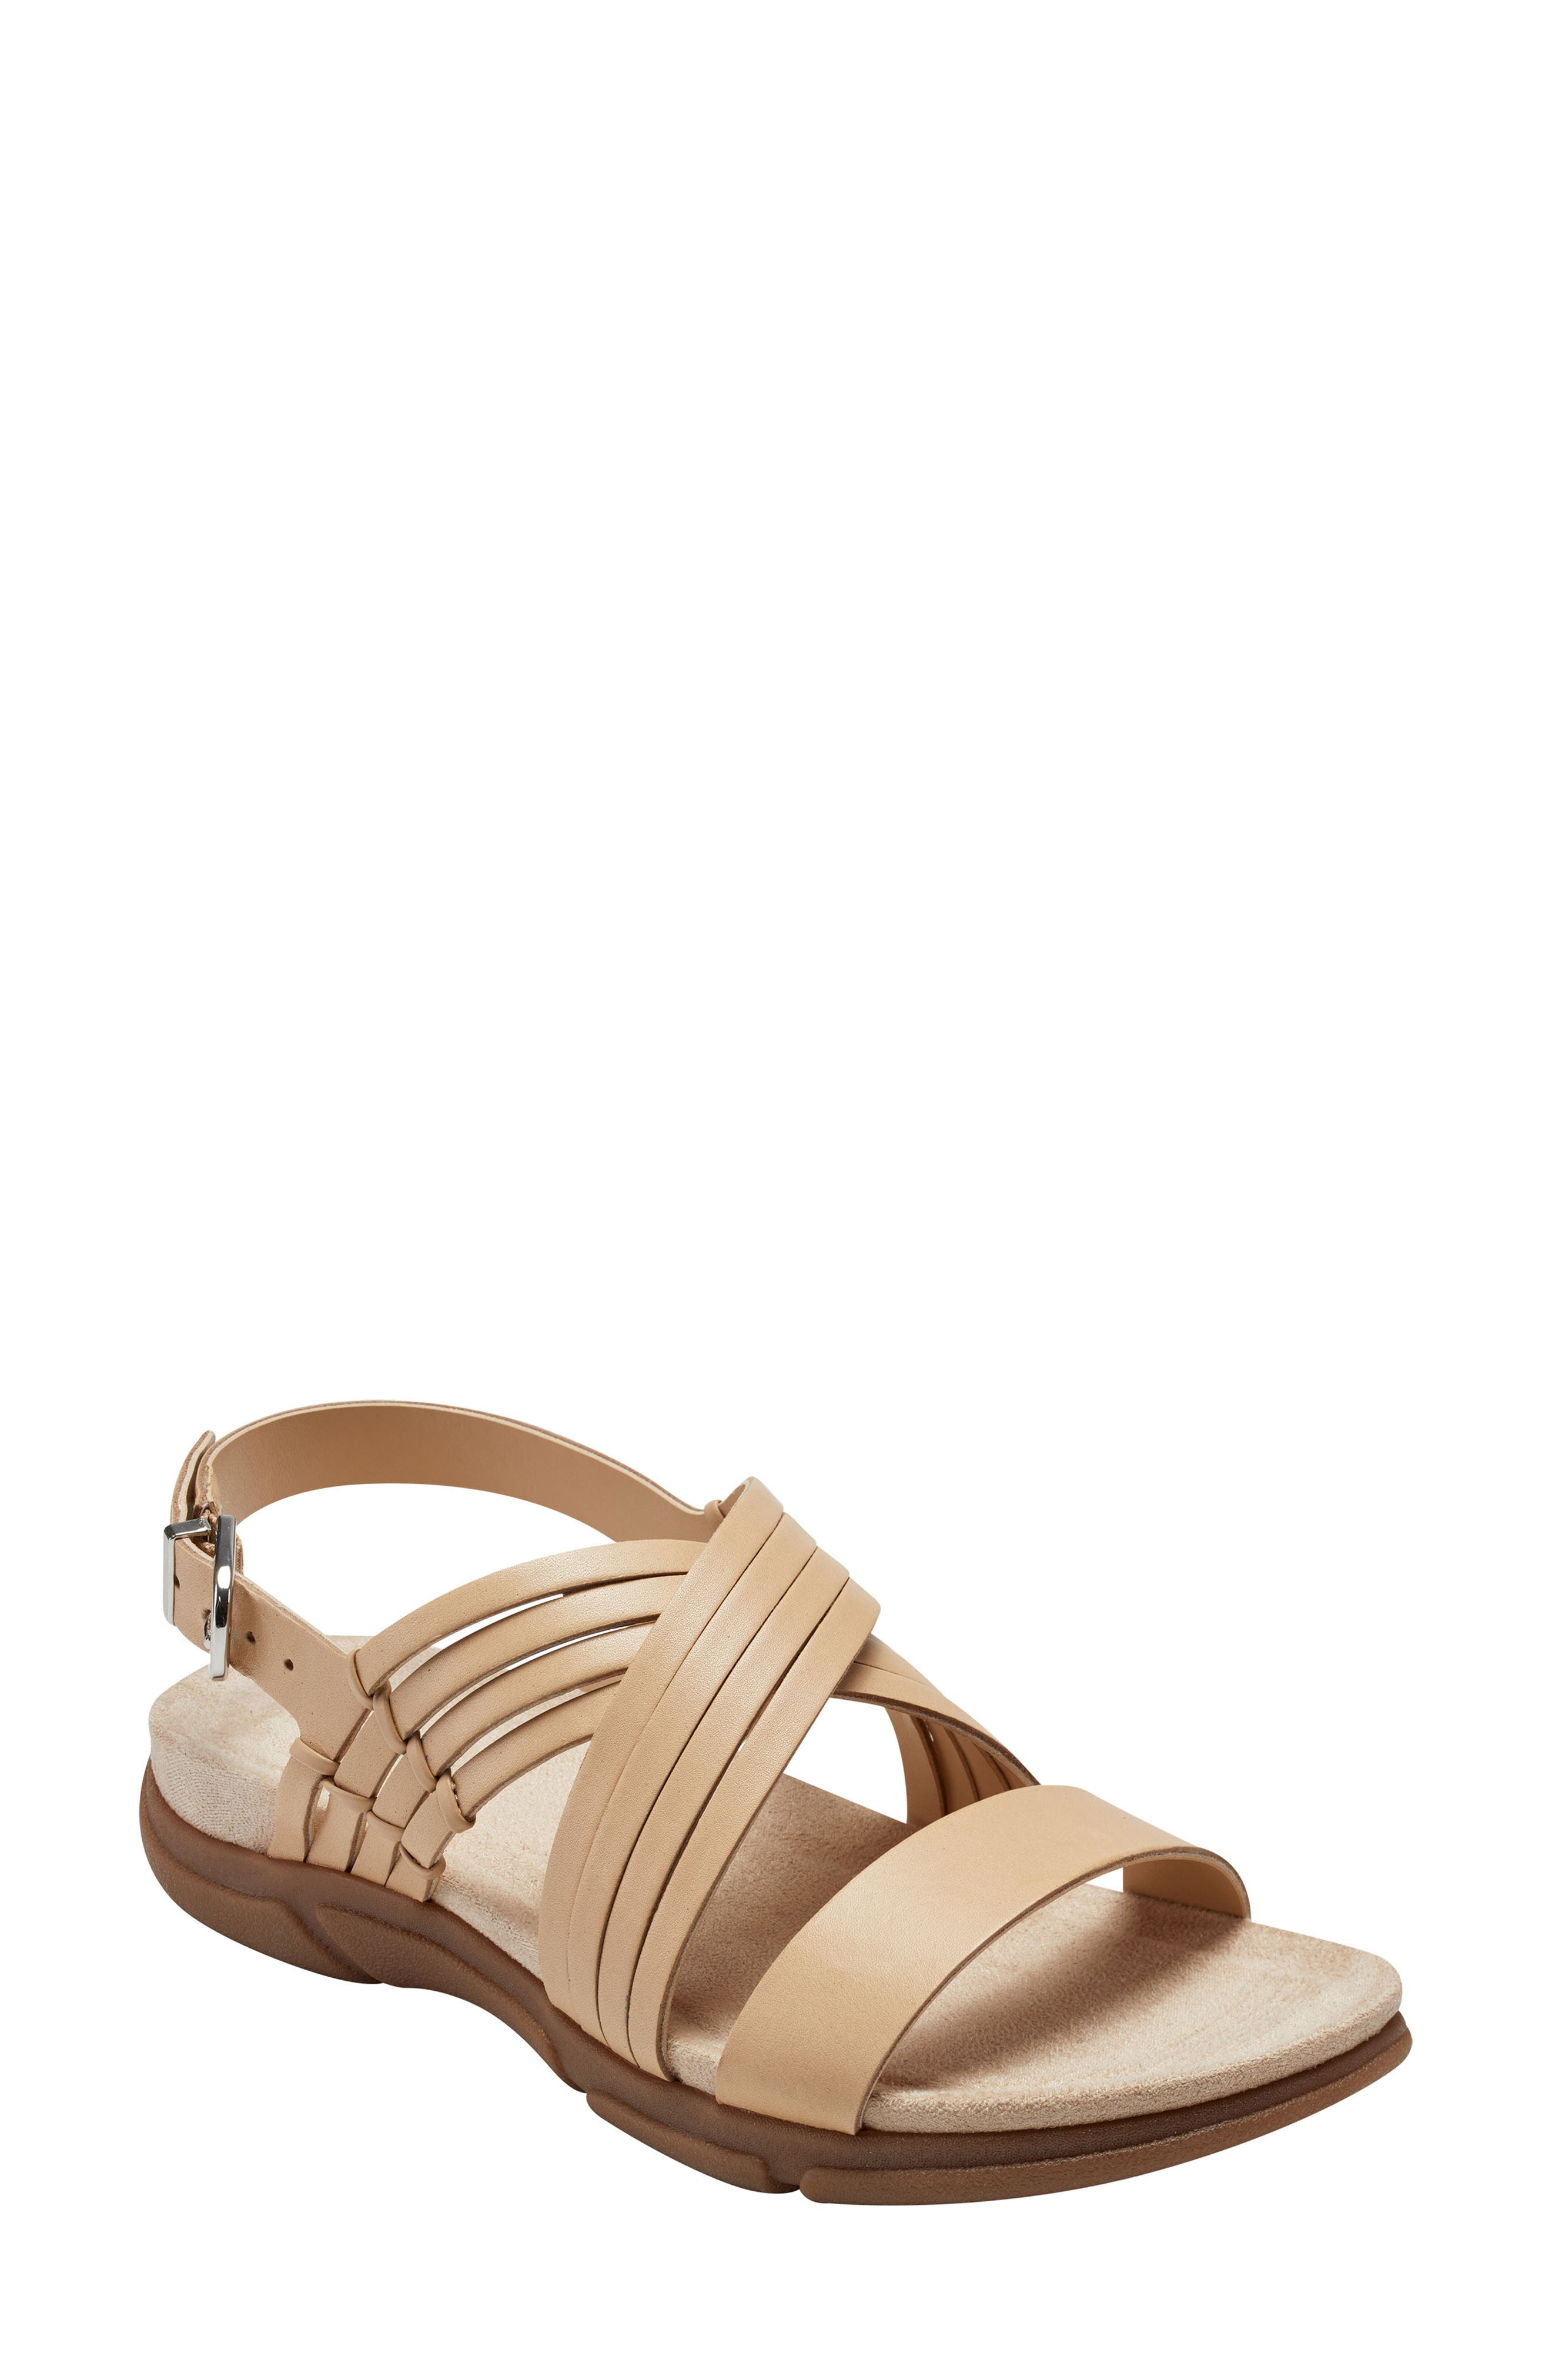 X Martha Stewart Marlis Sandal